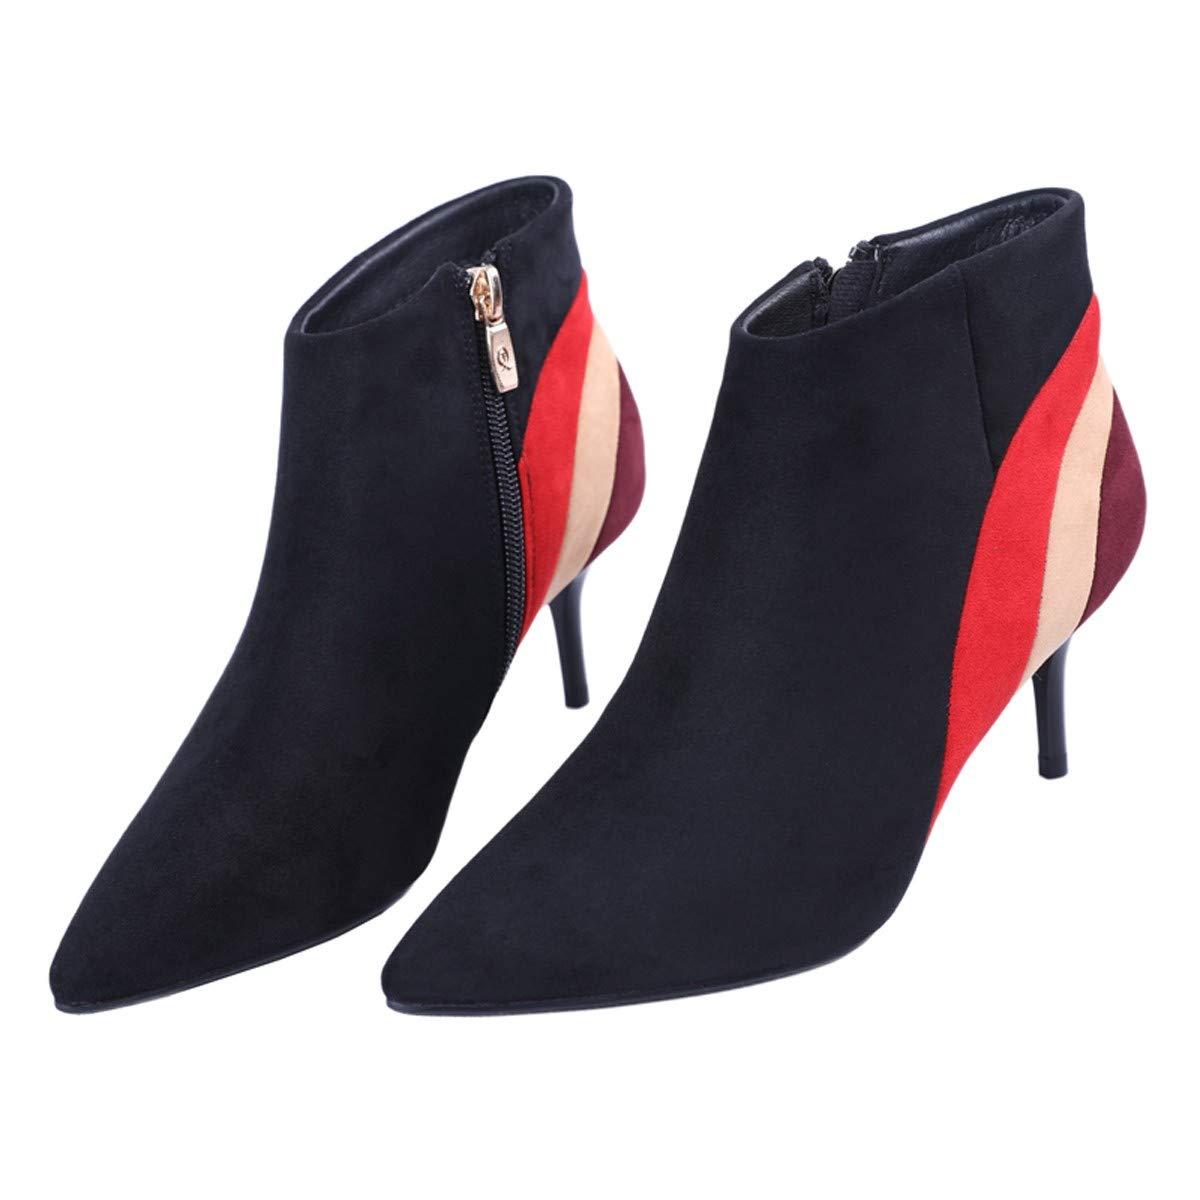 LBTSQ-Kurze Stiefel Mode Farbe Dünn Dünner Stiefel 6CmSpitze Hochhackigen Ma Ma Ma Dingxue. b4ecfa